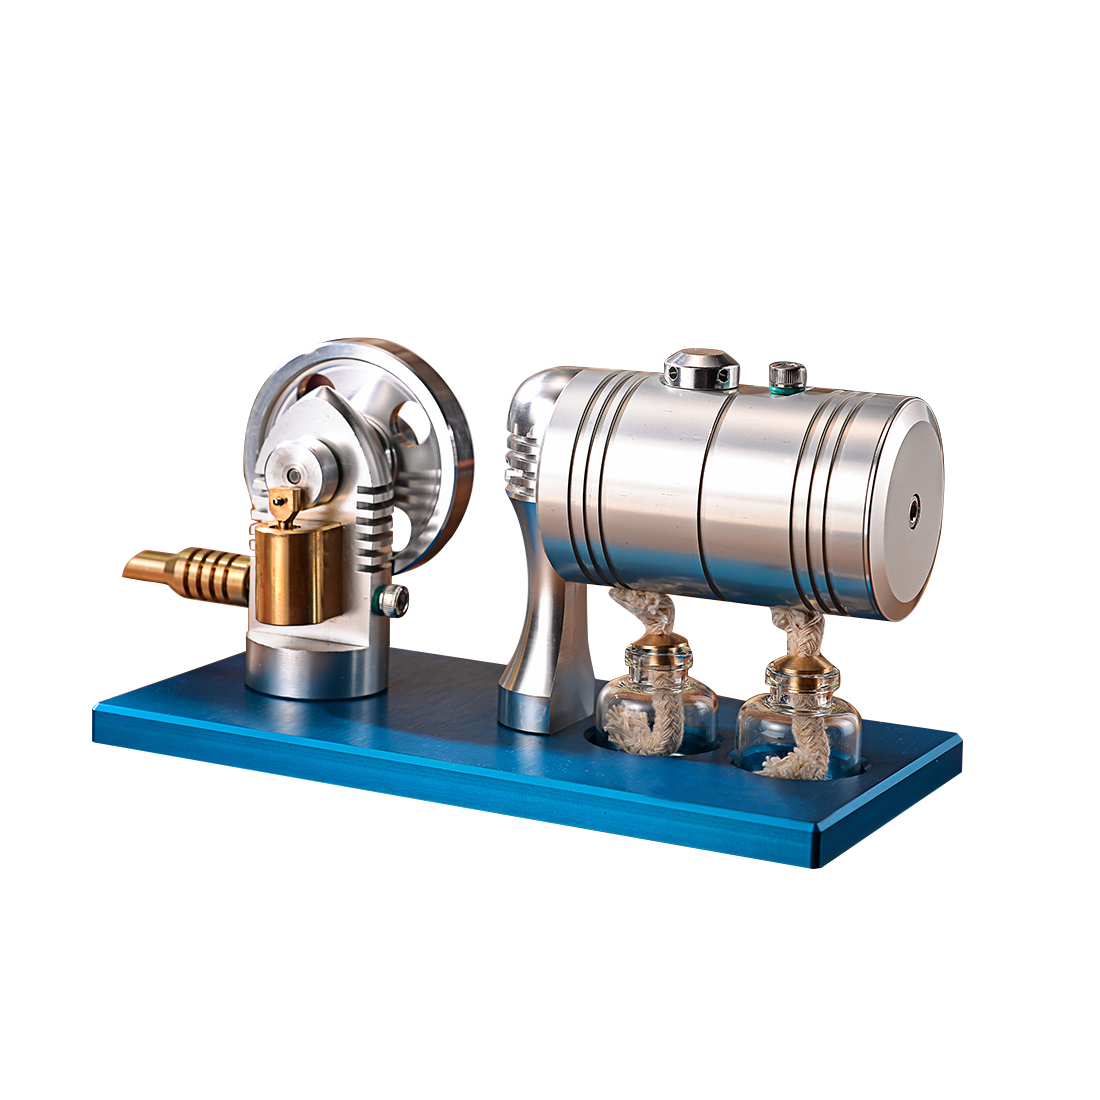 NFSTRIKE Metal Bootable Steam Engine Model Retro Stirling Engine Kids Model Building Kits with Heating Boiler